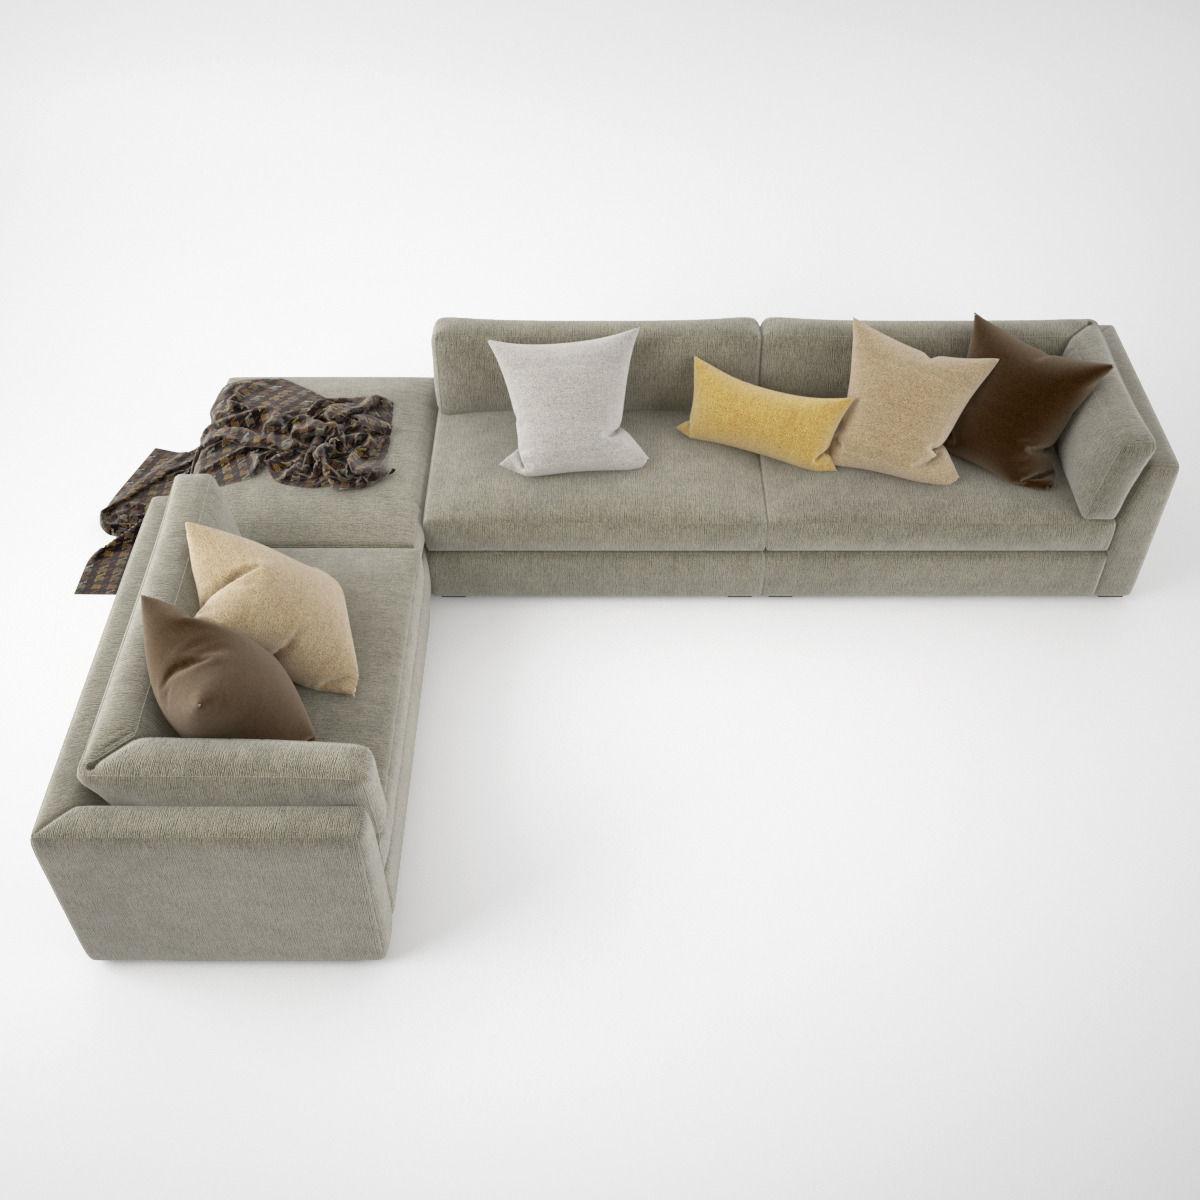 ... Busnelli Oh Mar Corner Sectional Sofa 3d Model Max Obj Fbx 6 ...